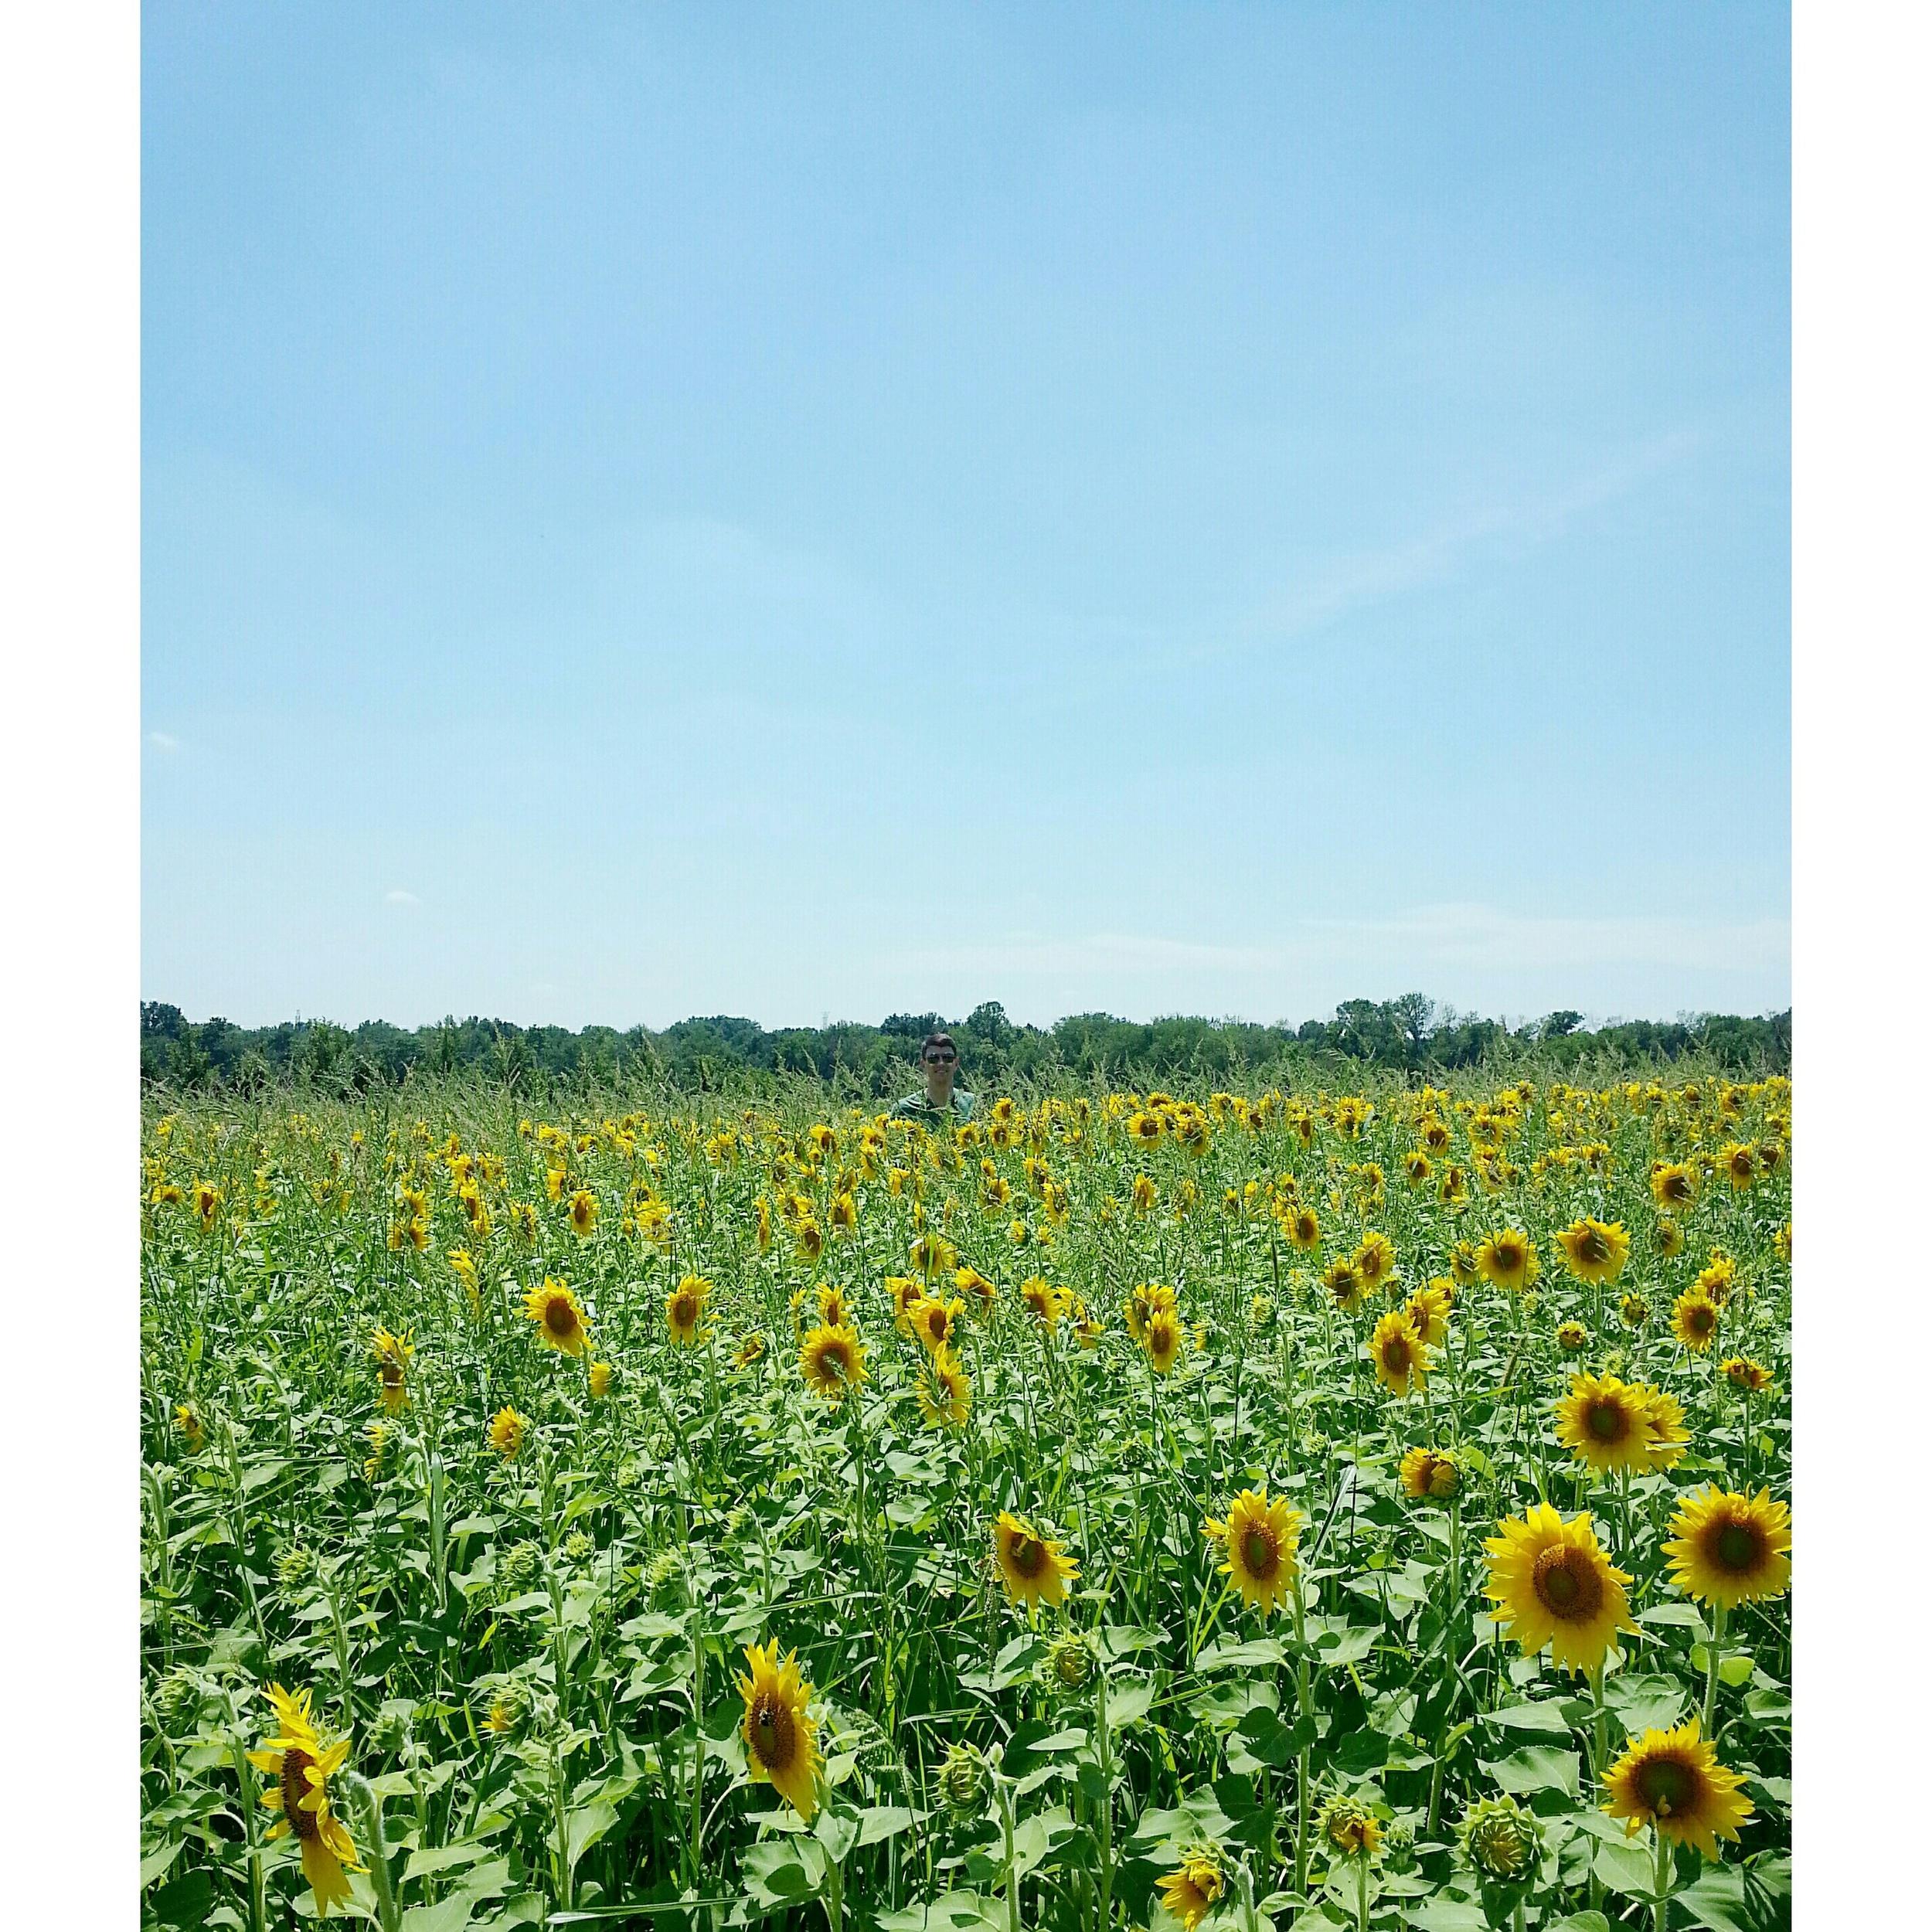 Sunflower Field Photo Shoot